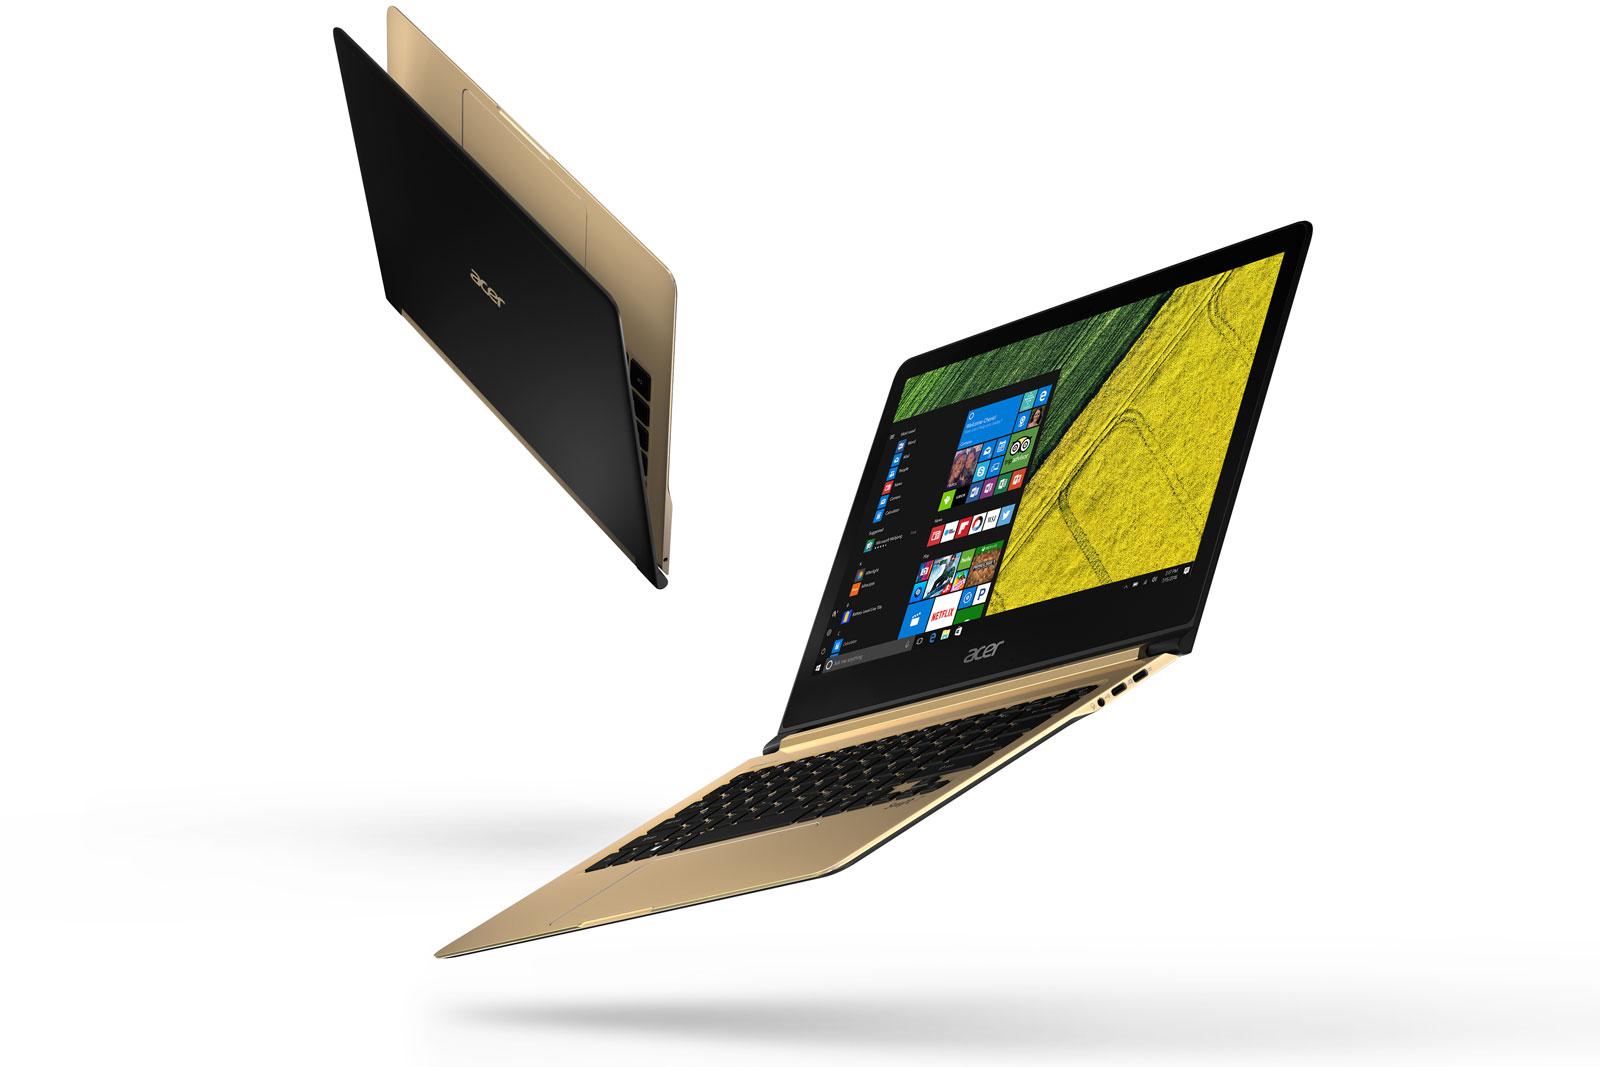 Acer's Swift 7 Ports